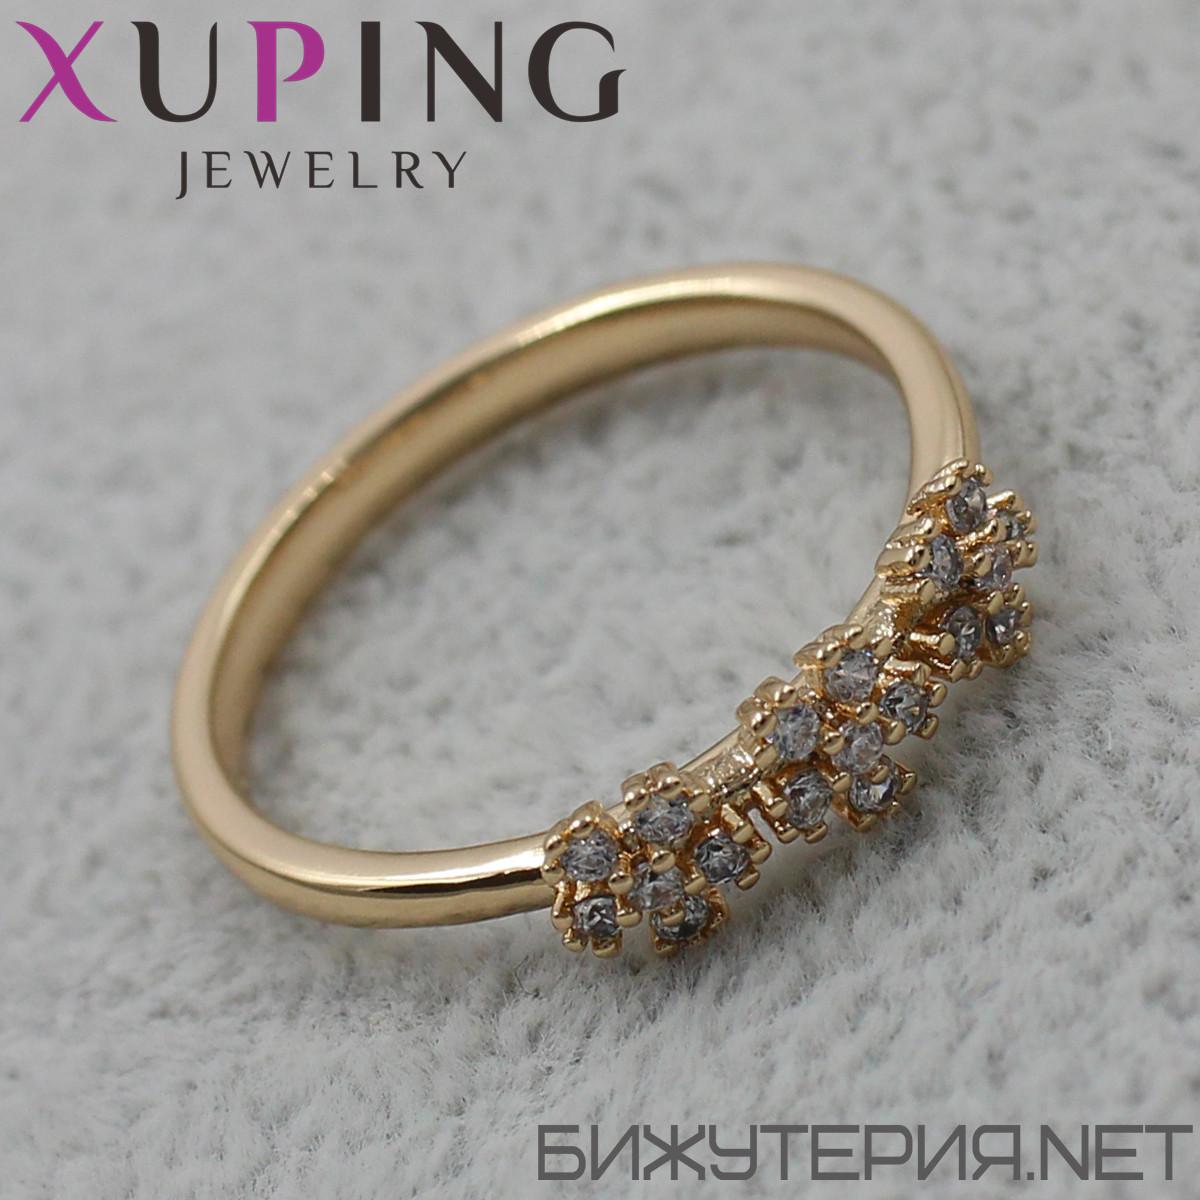 Кольцо Xuping медицинское золото 18K Gold - 1027640537 17